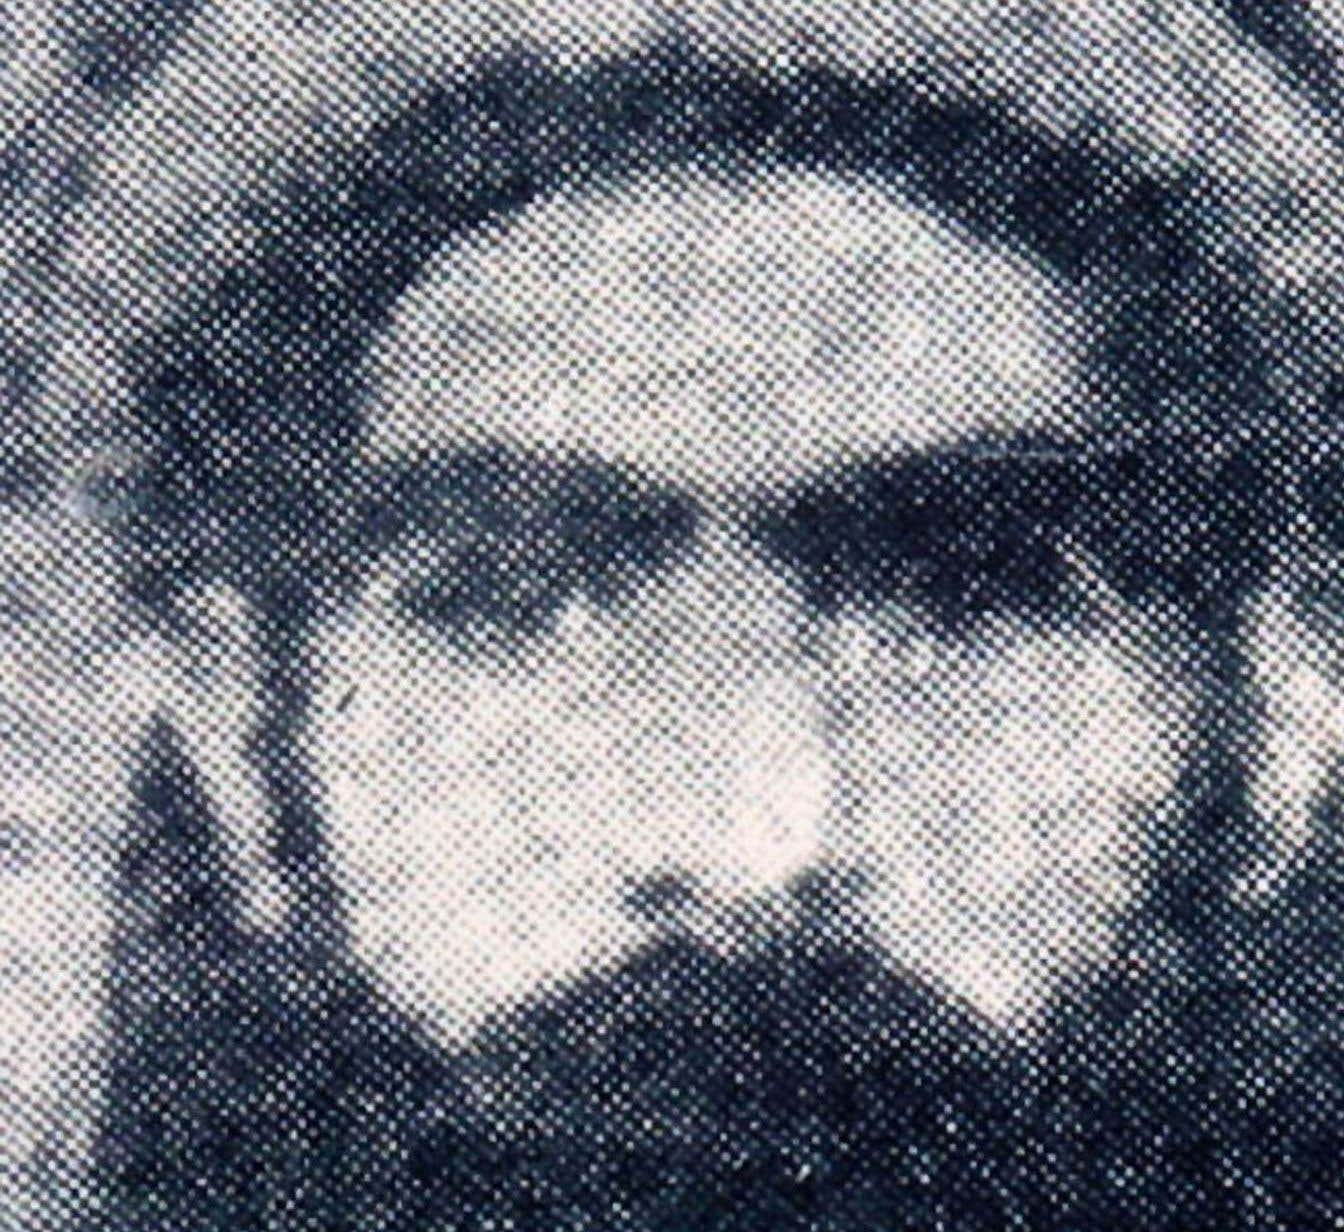 Le mollah Omar est mort... en 2013